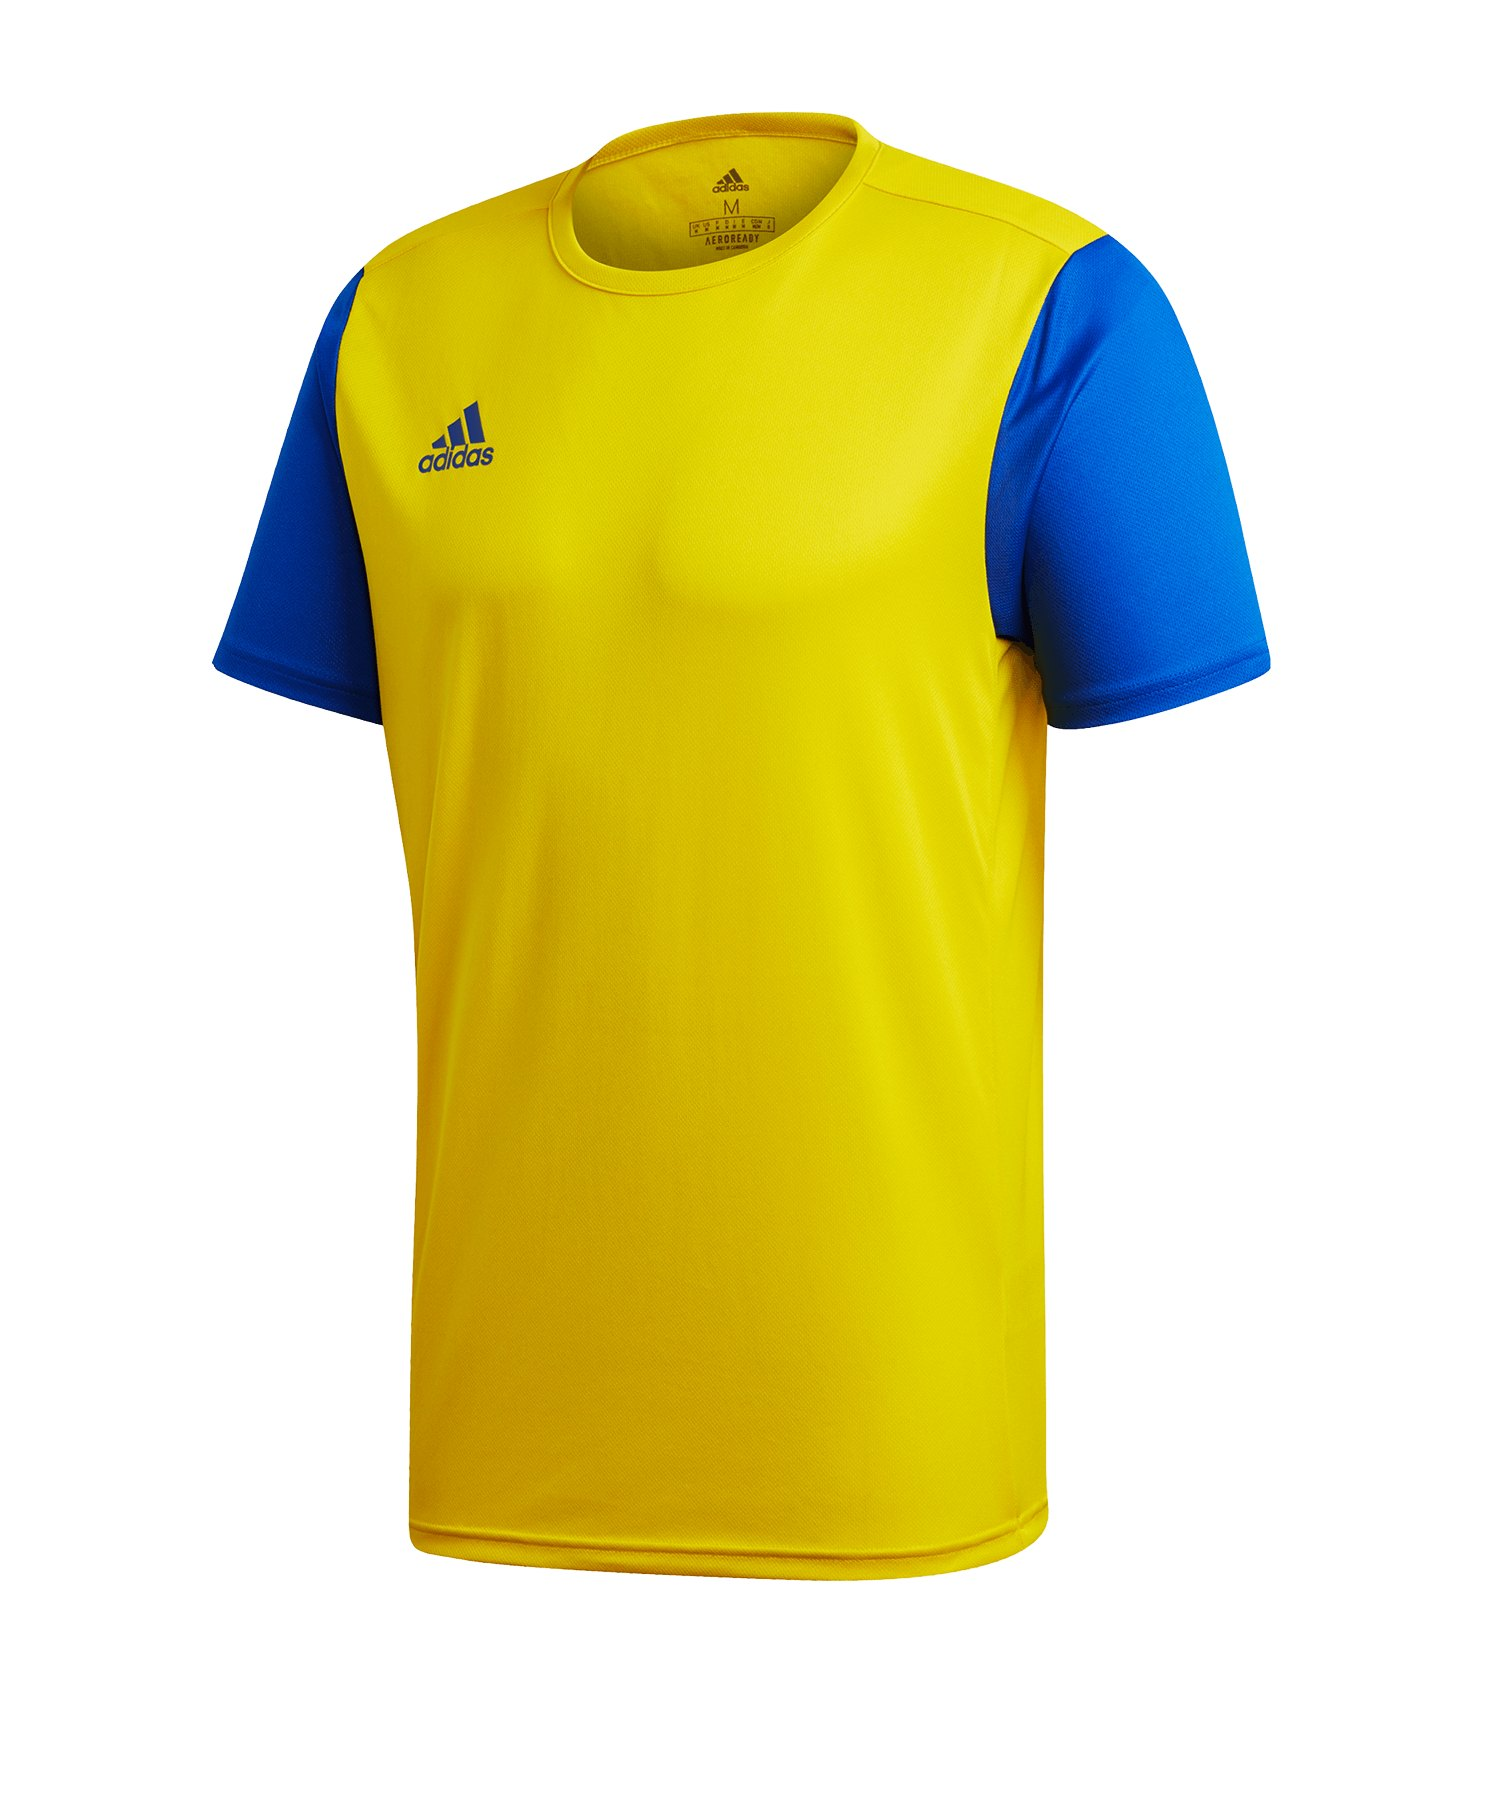 adidas Estro 19 Trikot kurzarm Gelb Blau - gelb